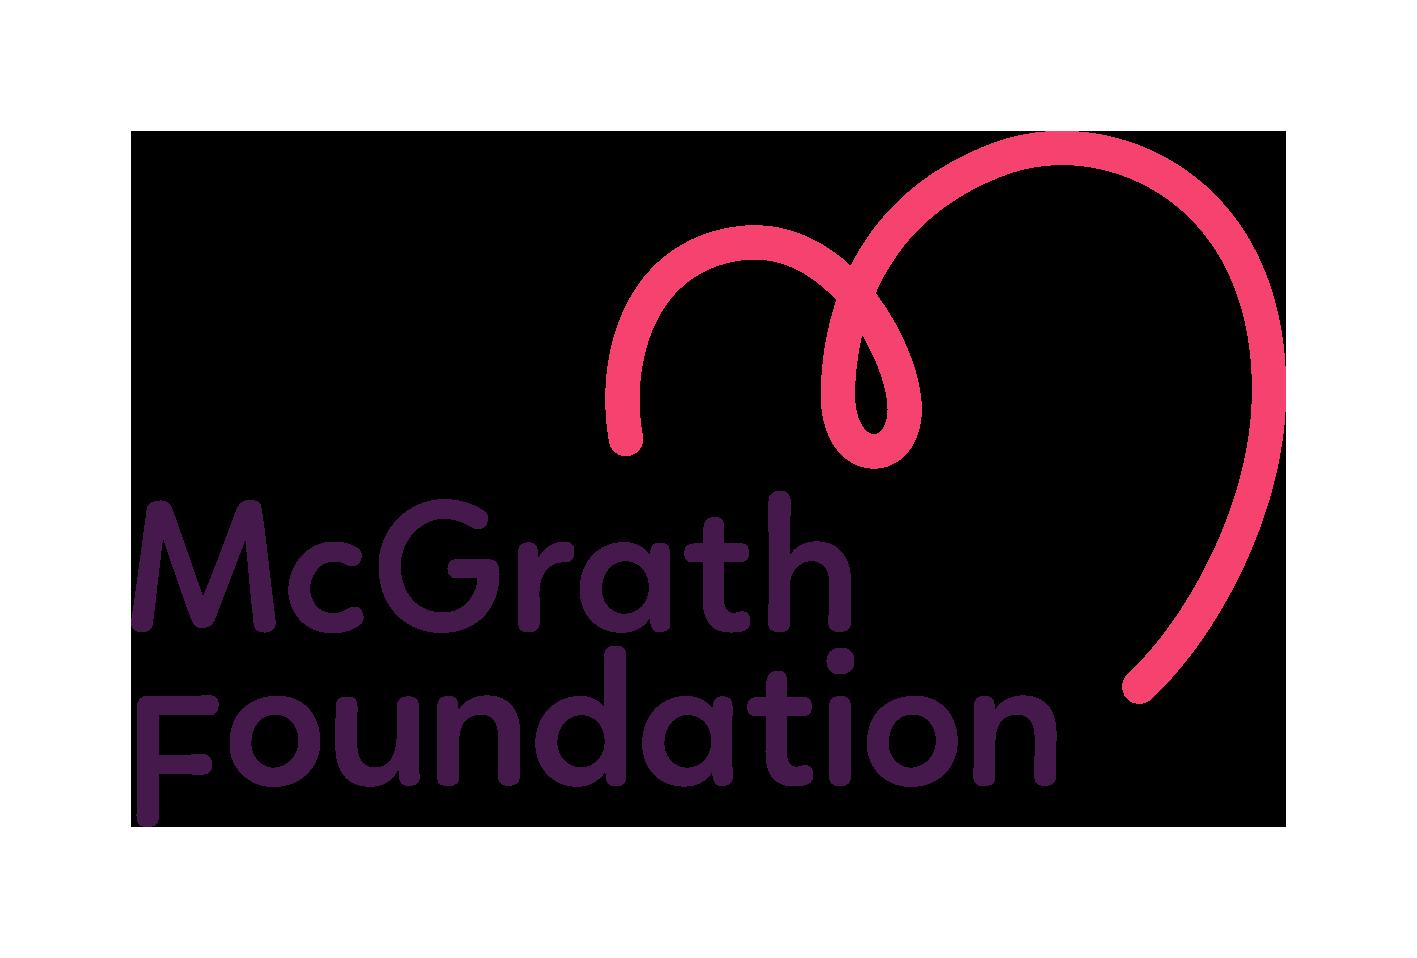 McGrath Foundation sunboost australia